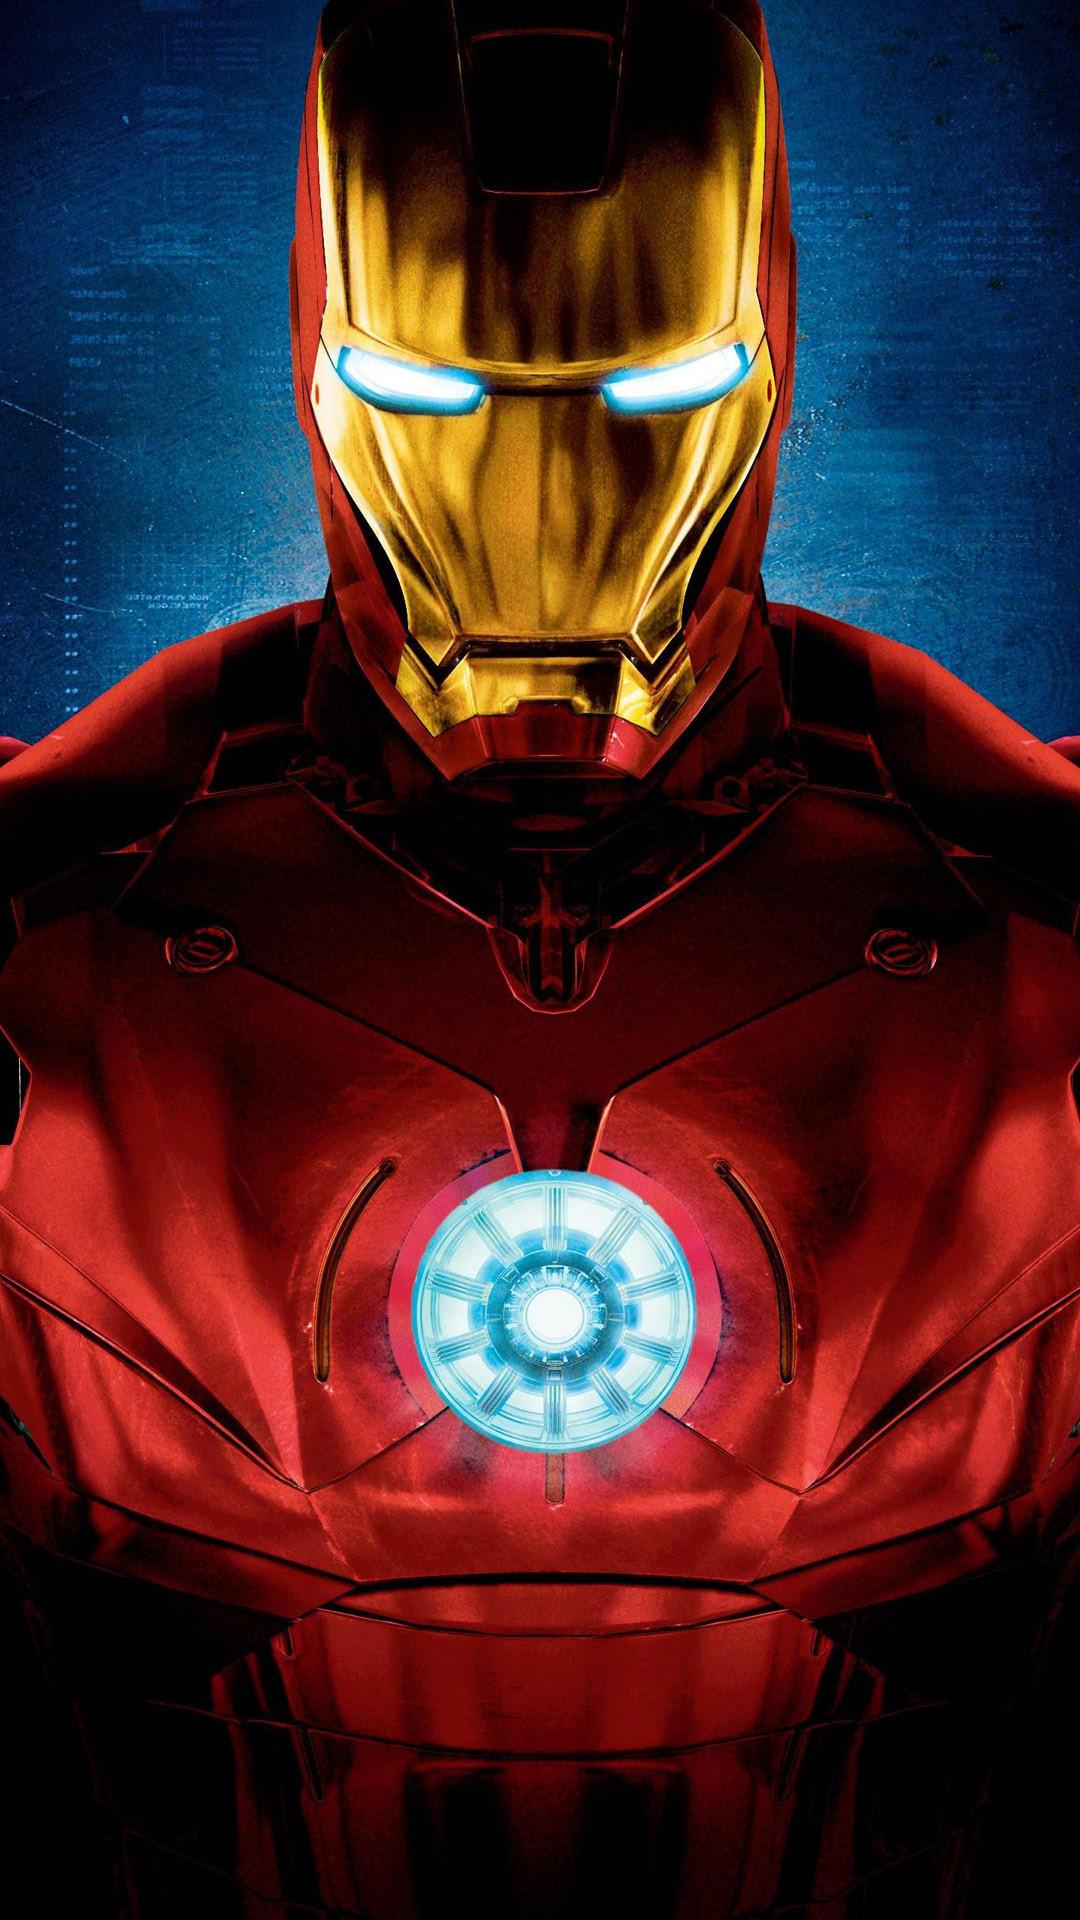 Iron man jarvis wallpaper hd 72 images - Man wallpaper ...